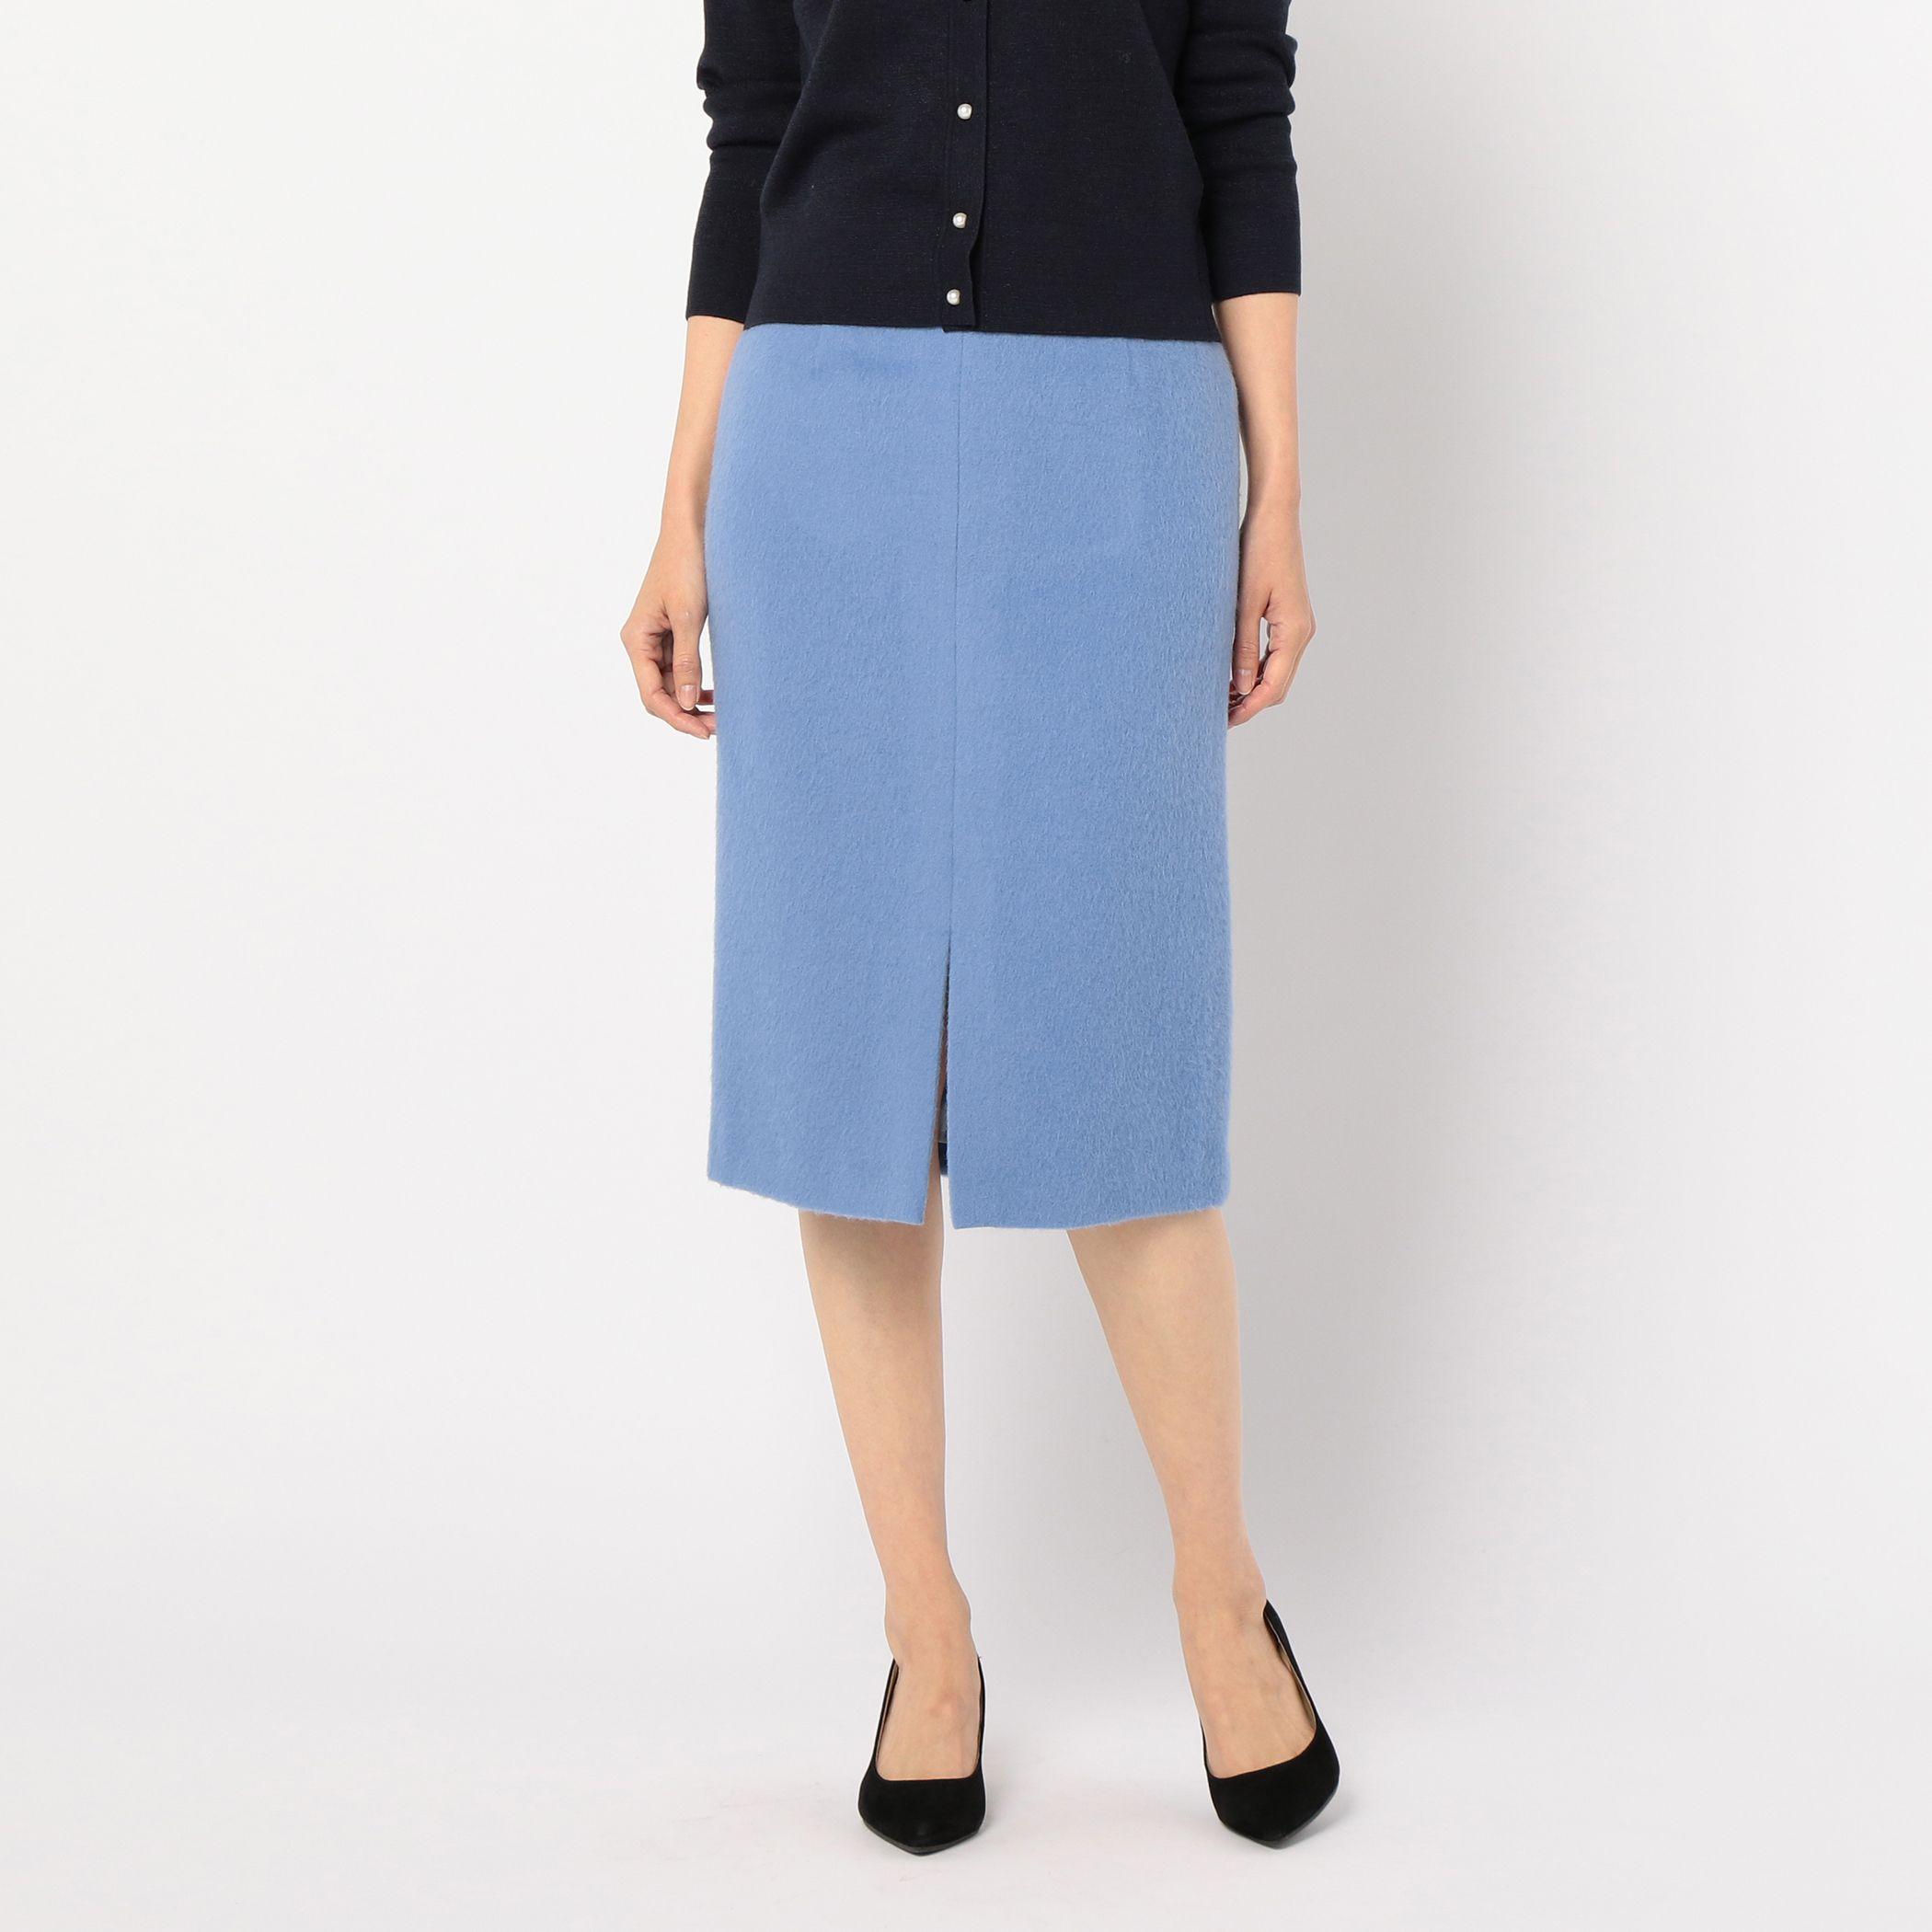 NOLLEY'Sノーリーズ/アルパカシャギータイトスカート